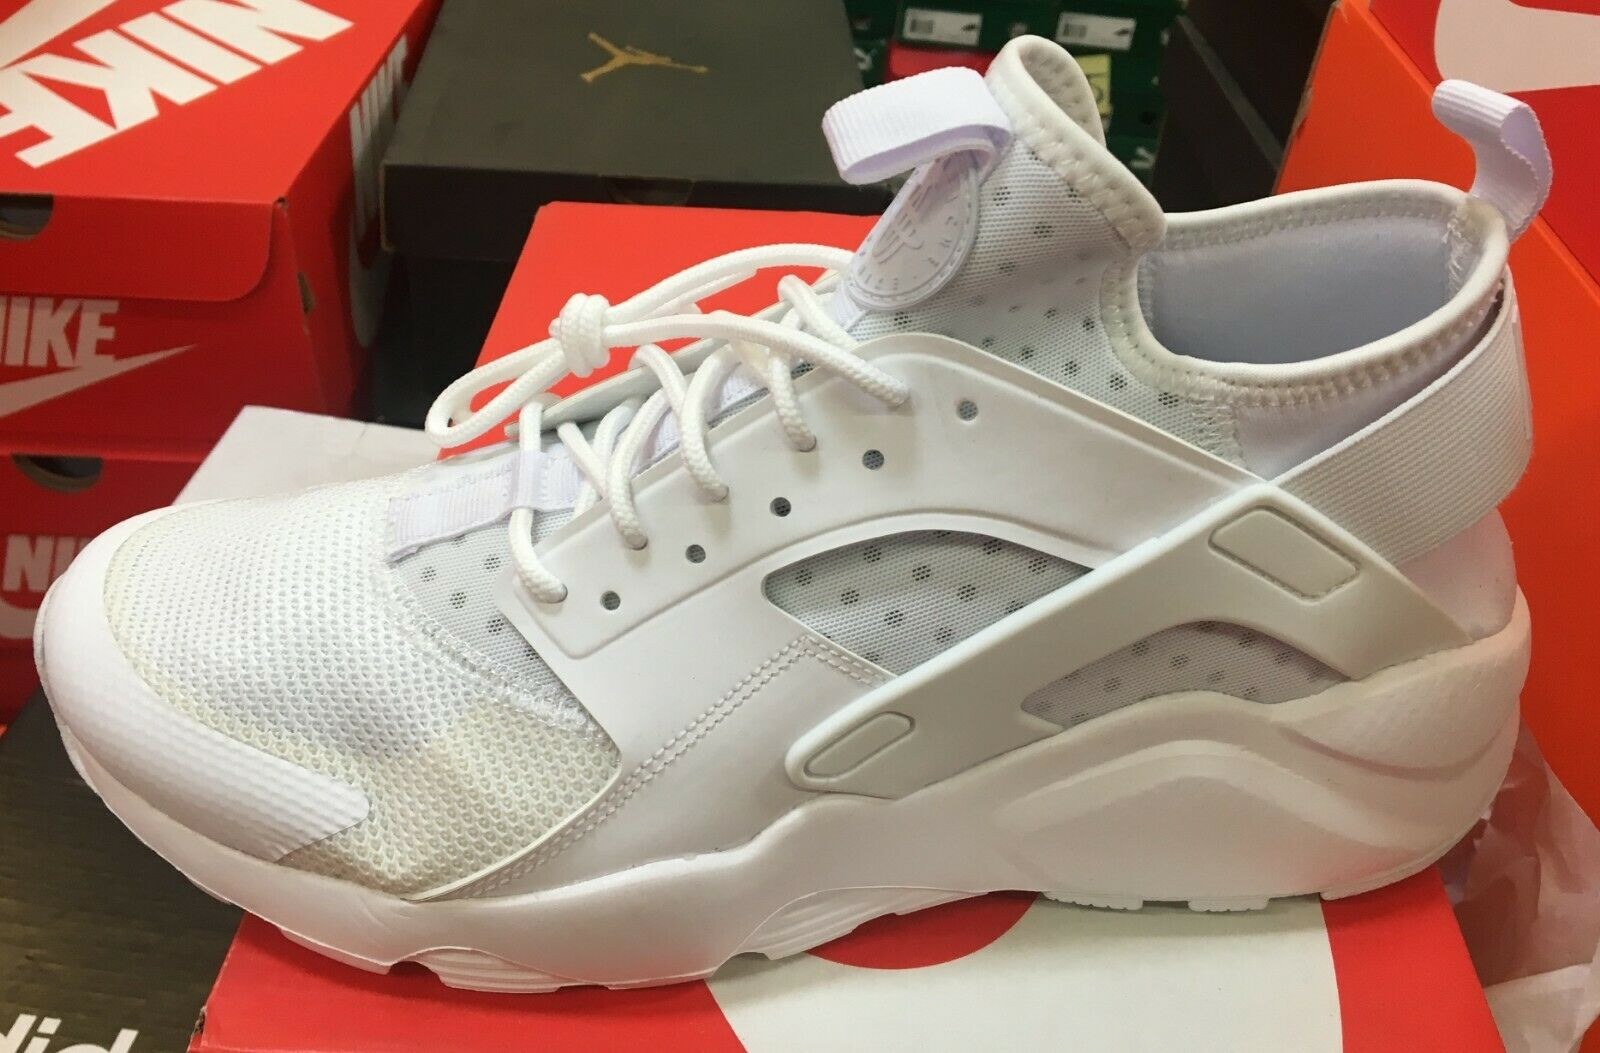 NIKE Air Huarache Run Ultra  Men's Running Training shoes White 819685 101  K